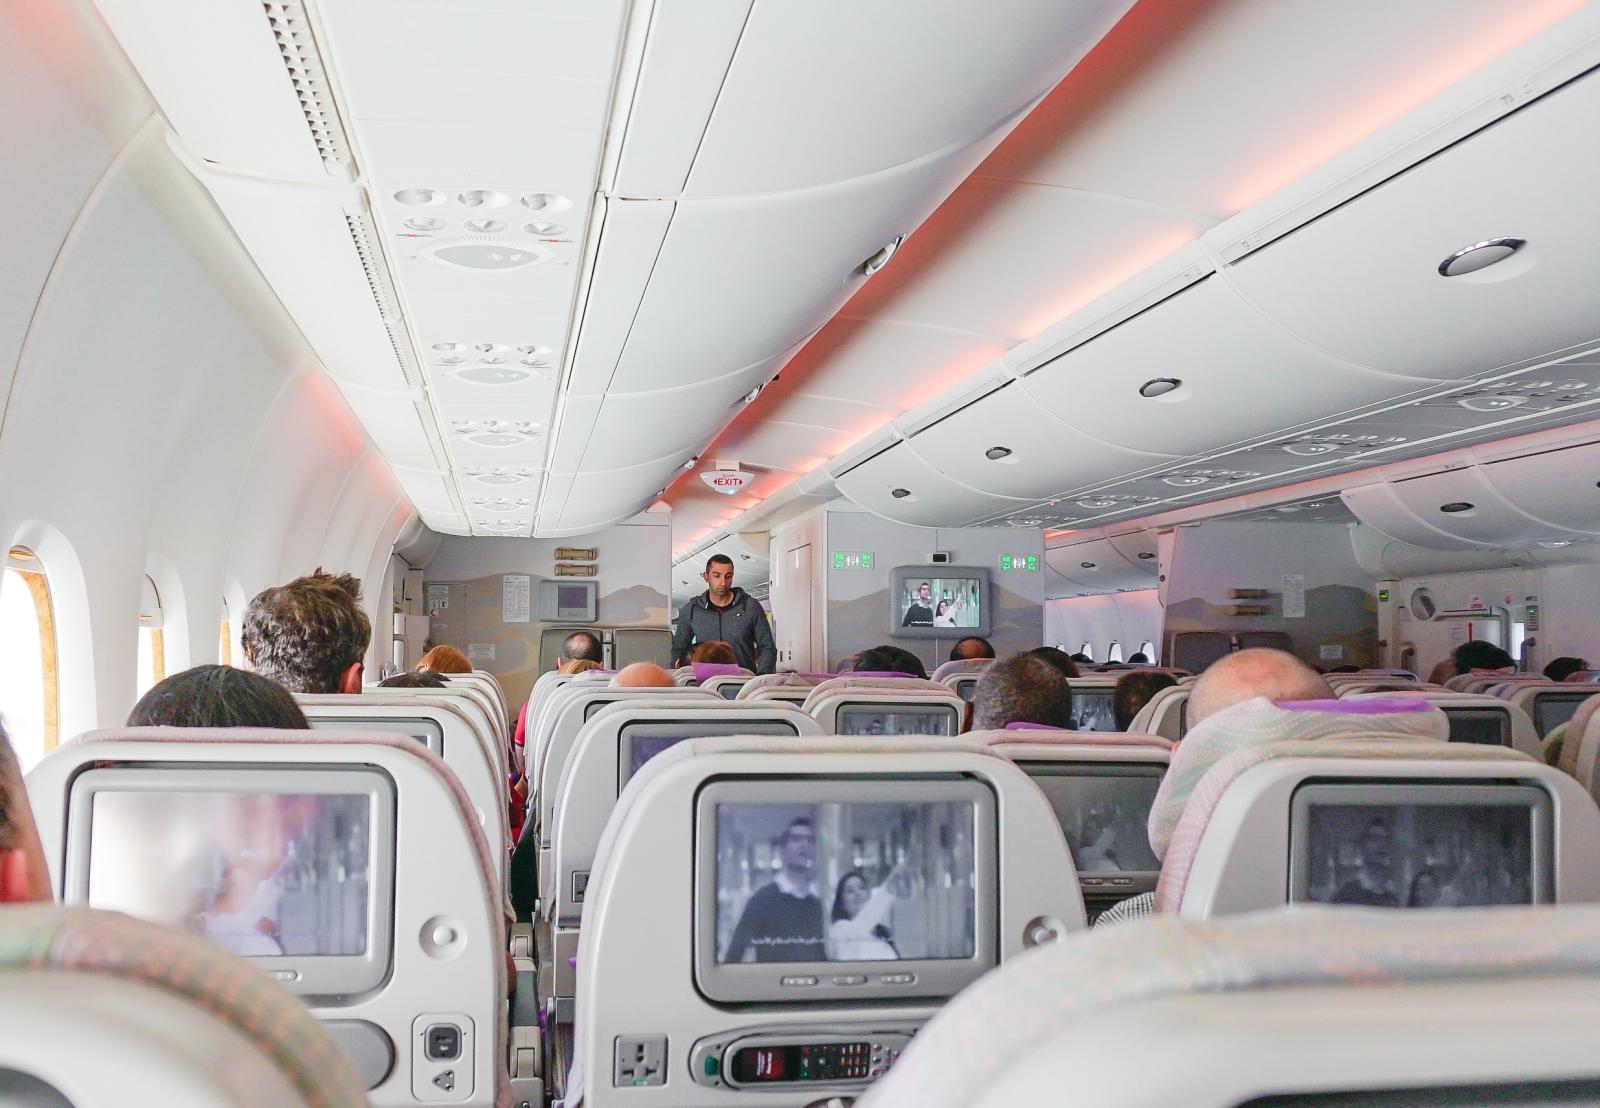 ᐅ Flug Australien 7 Tipps Fur Gunstige Fluge Nach Australien 2019